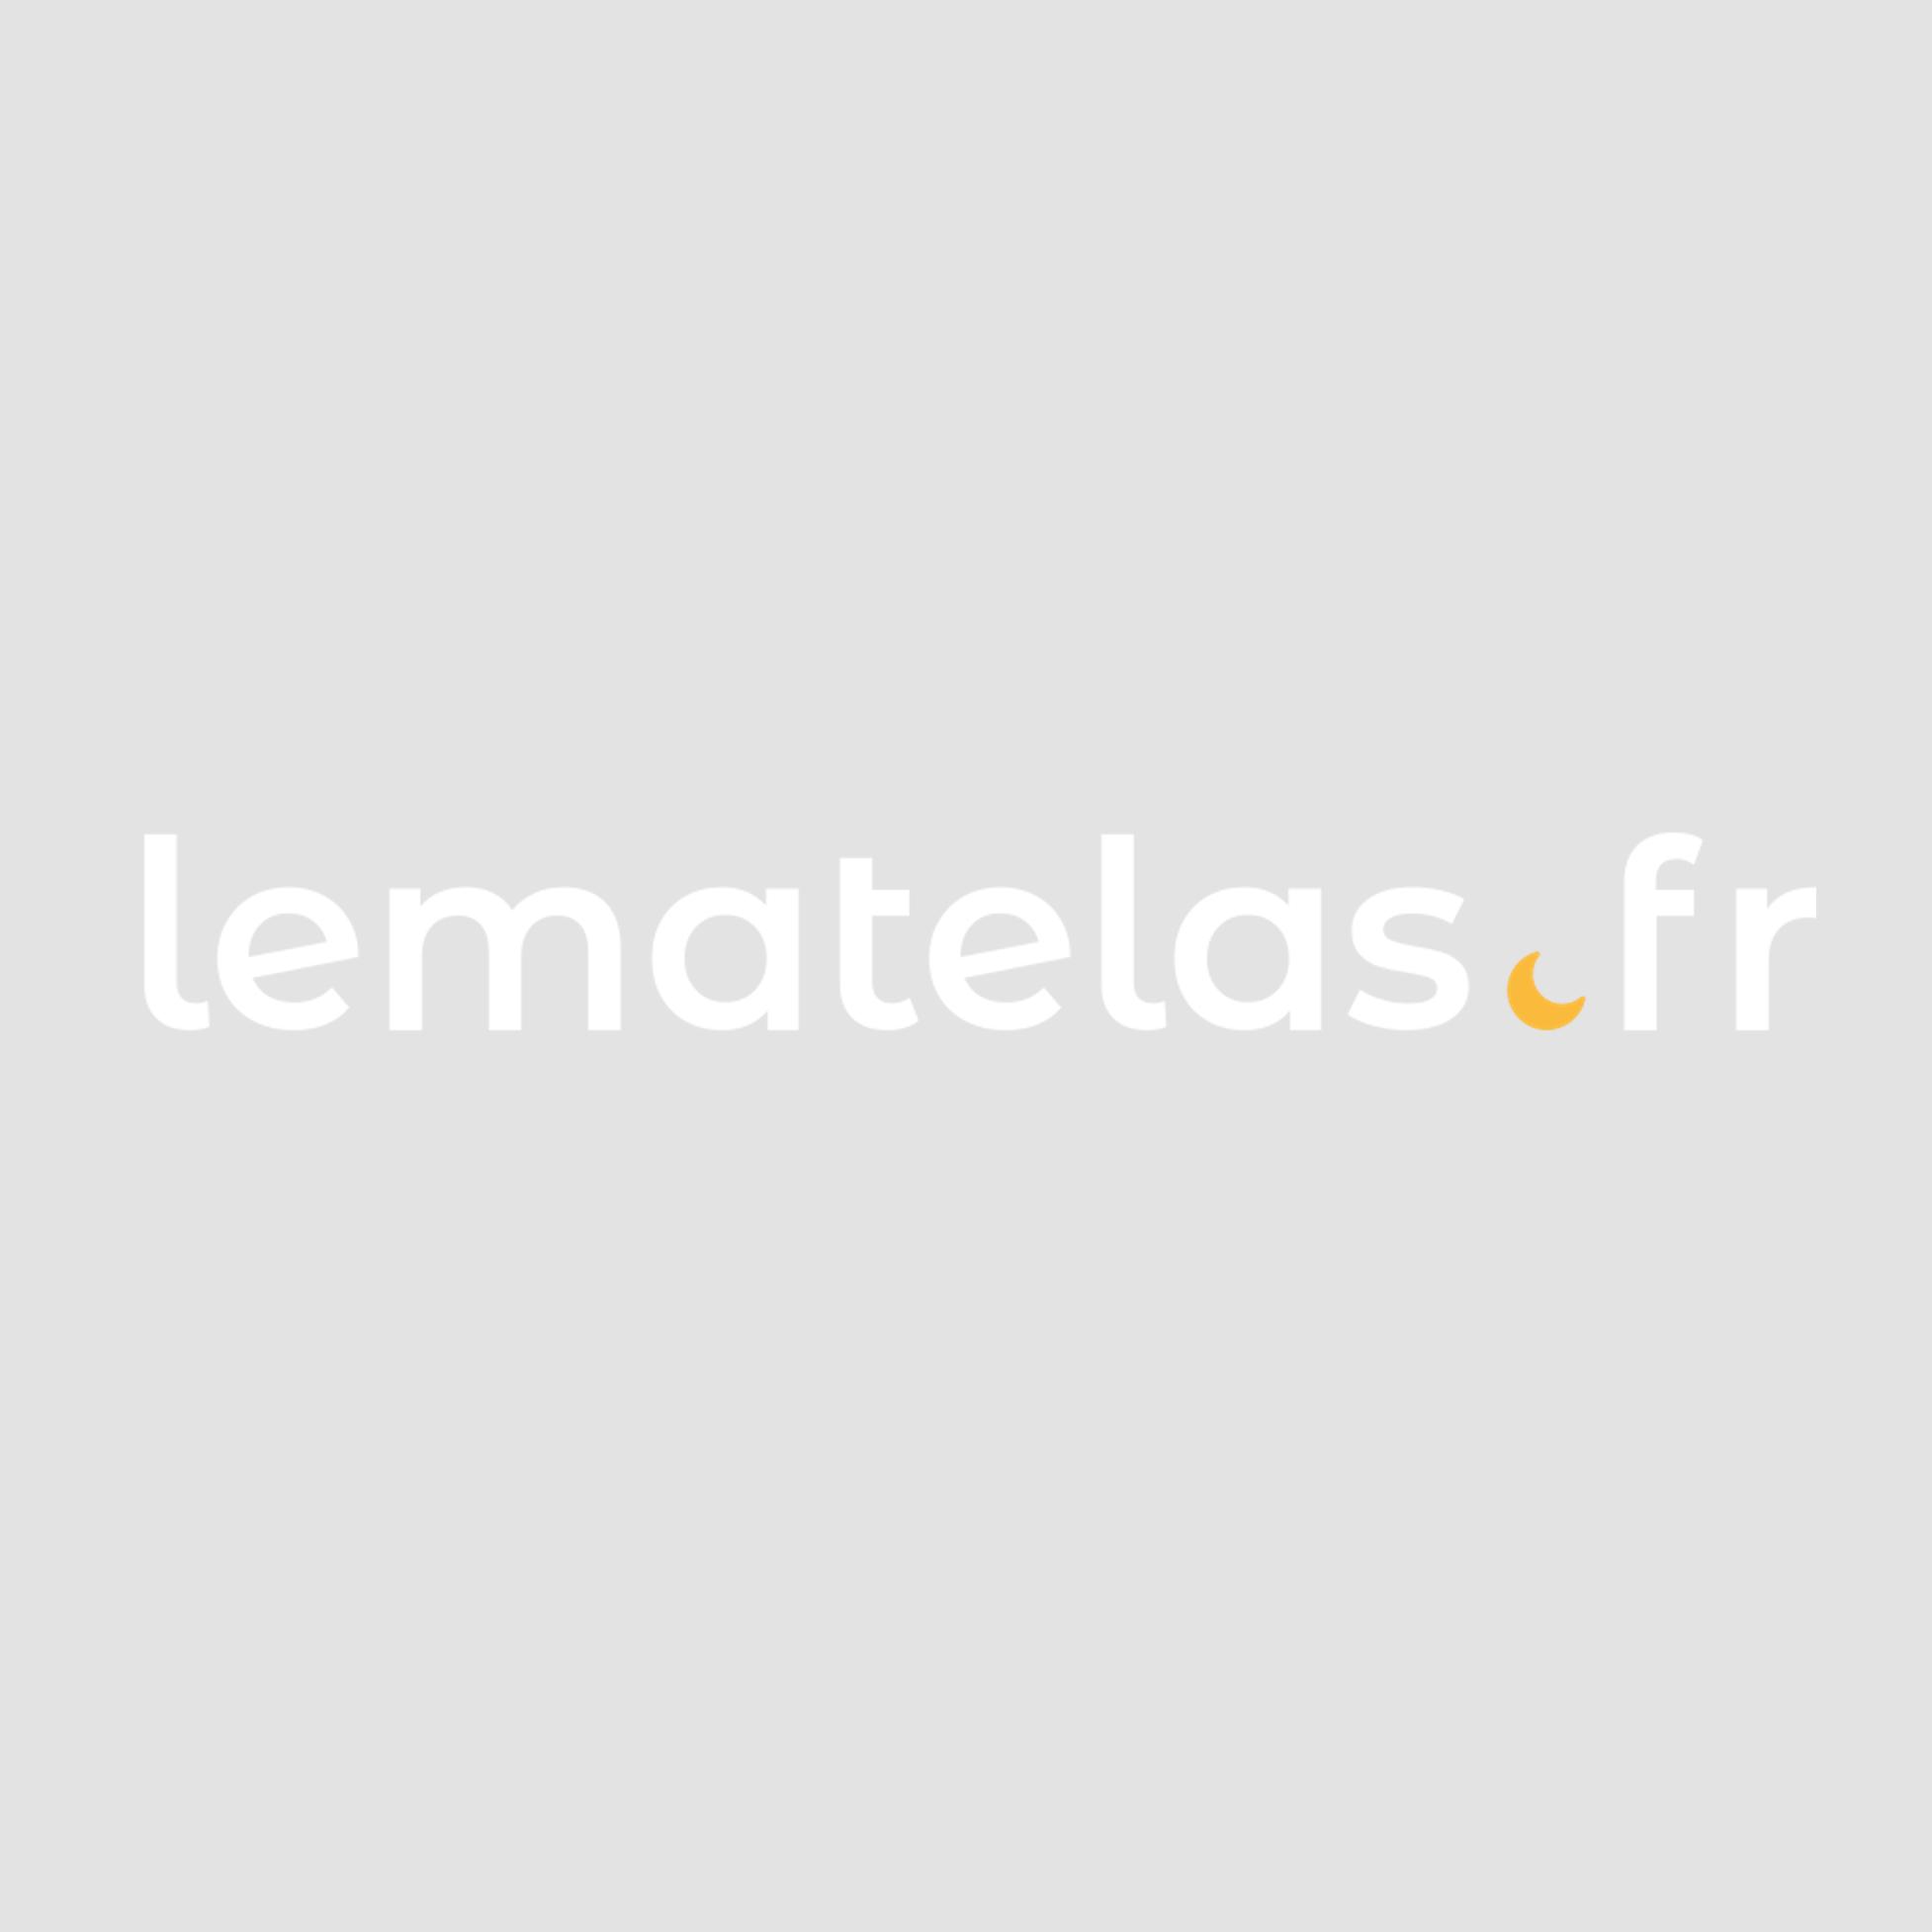 Lot de 2 oreillers grand confort 60x60 poids